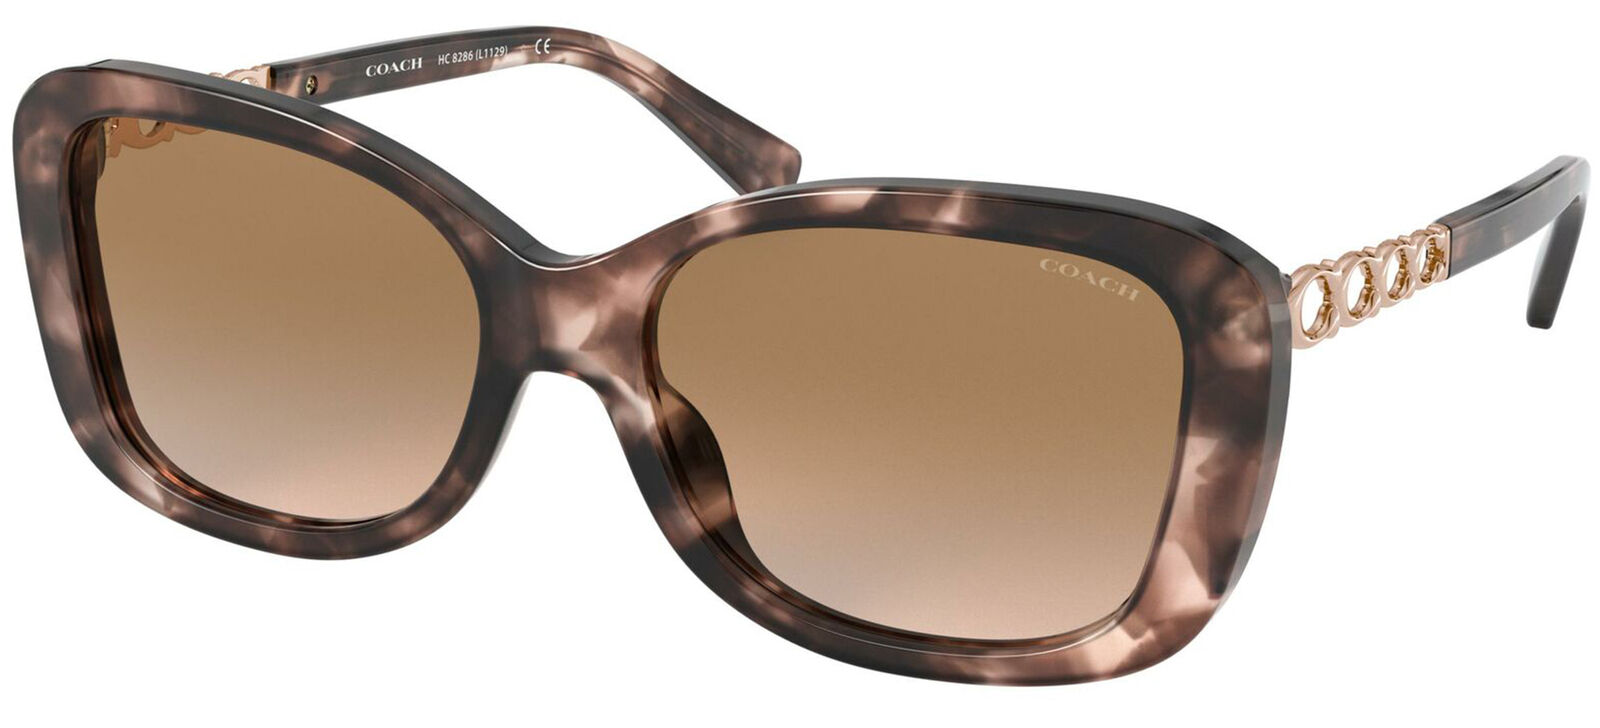 Coach HC 8286 Pink Havana/Light Brown Shaded 57/17/140 women Sunglasses